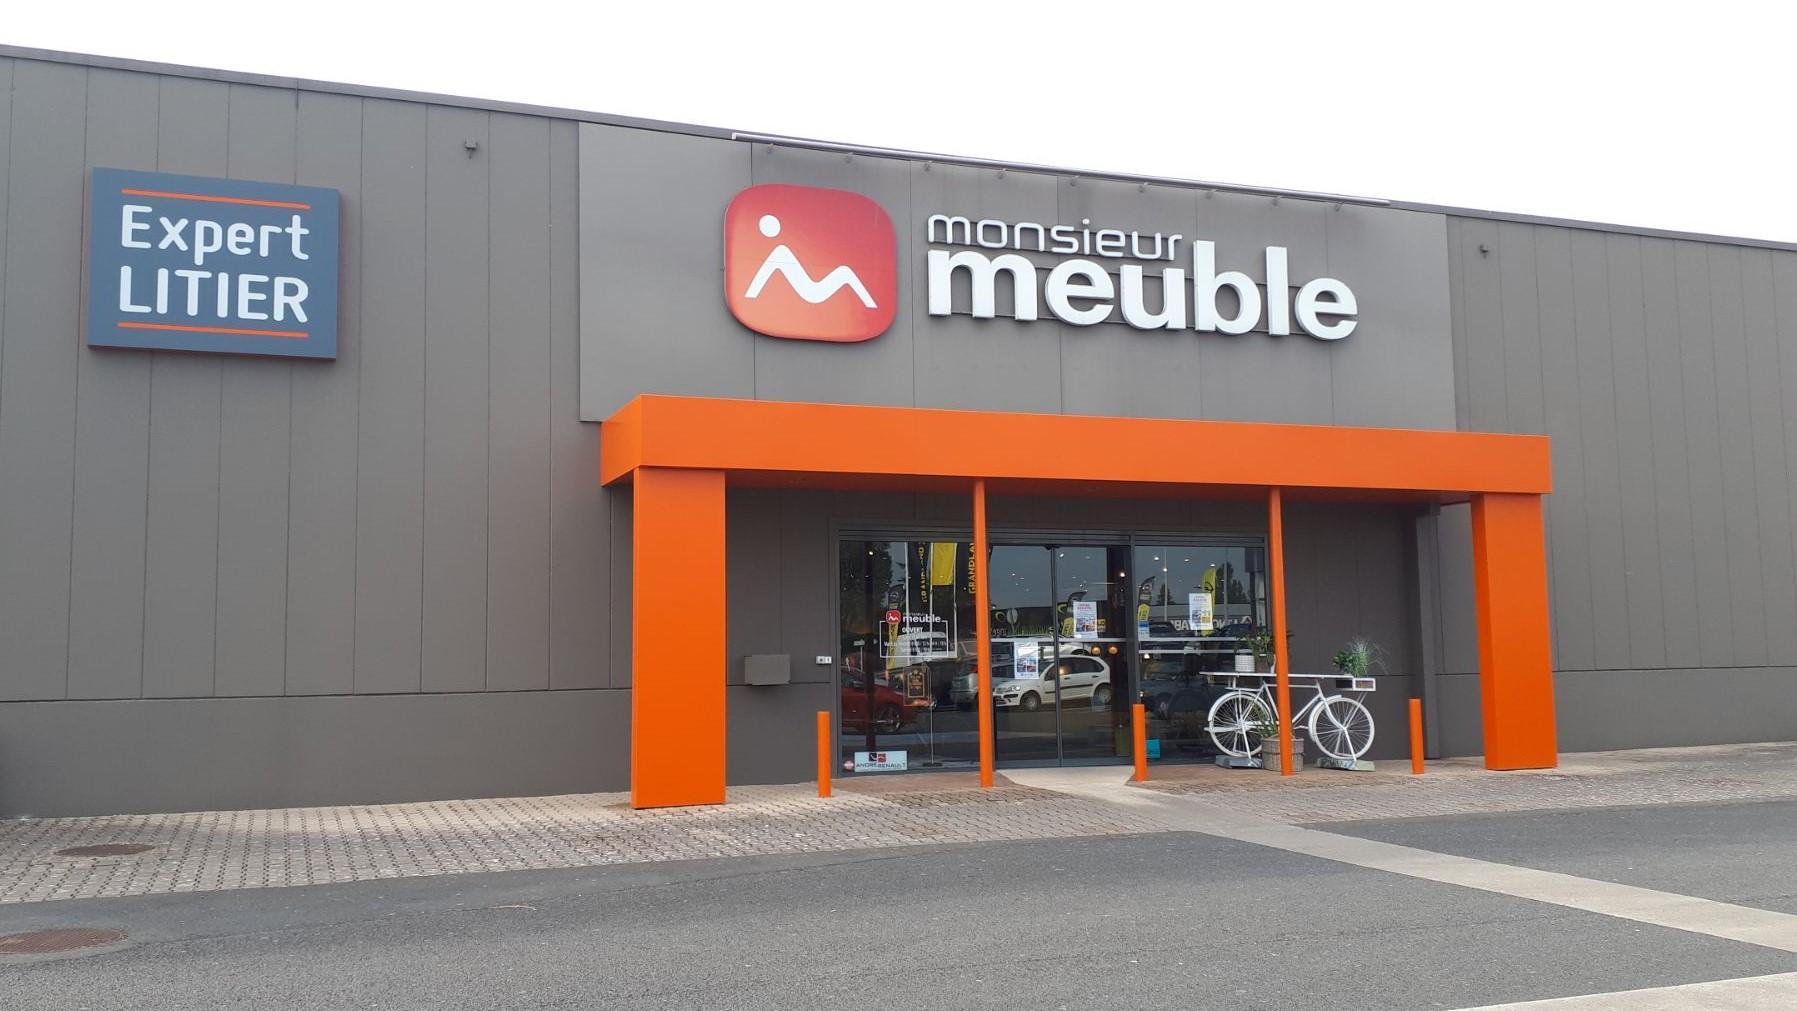 Monsieur Meuble Cholet Meubles Celio Fabricant Francais